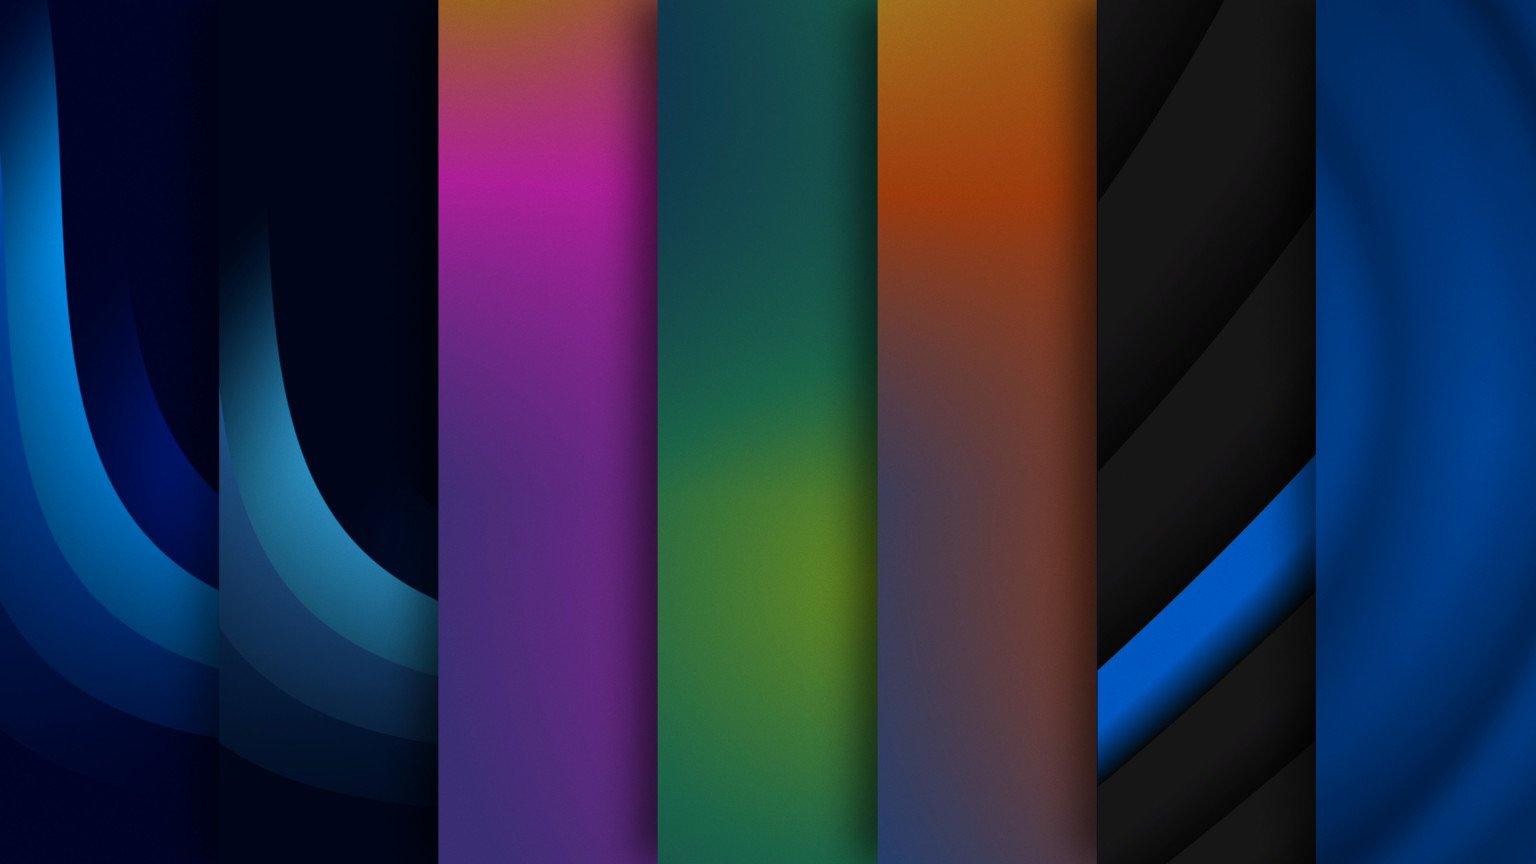 xbox-series-dynamic-backgrounds.jpg